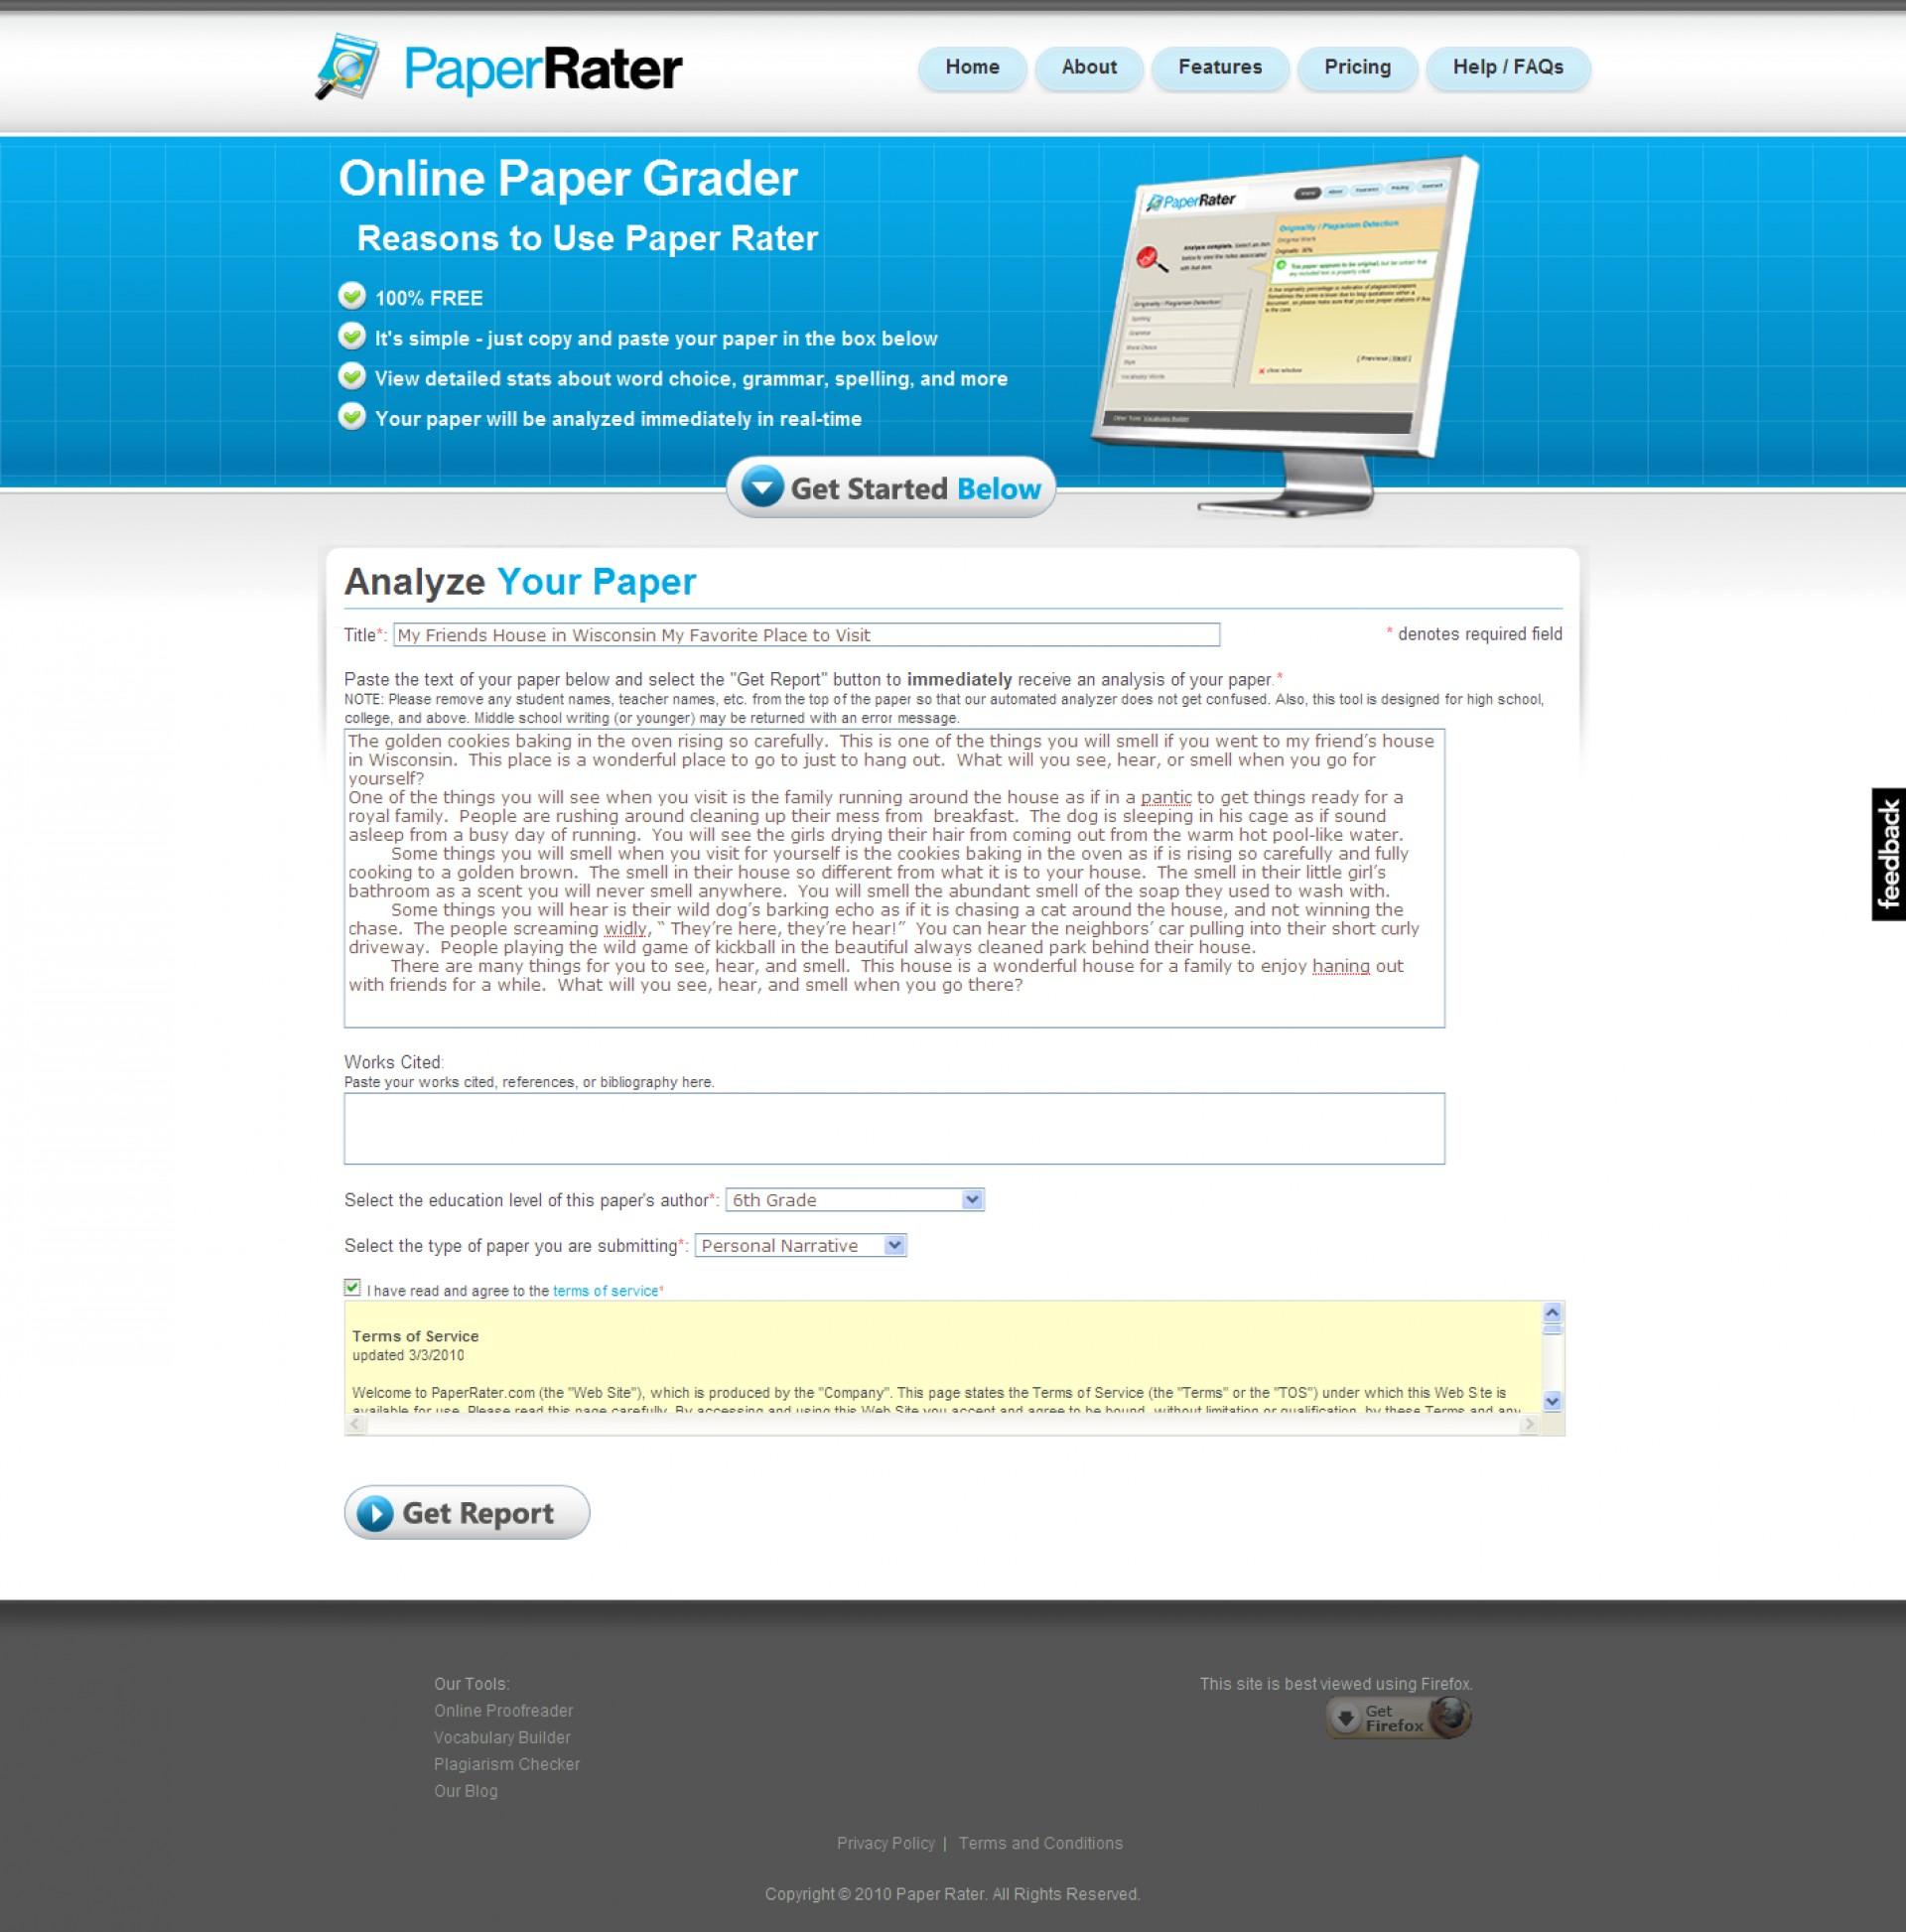 007 Essay Checker Free Online Example Amazing Sentence Grammar Plagiarism Document 1920